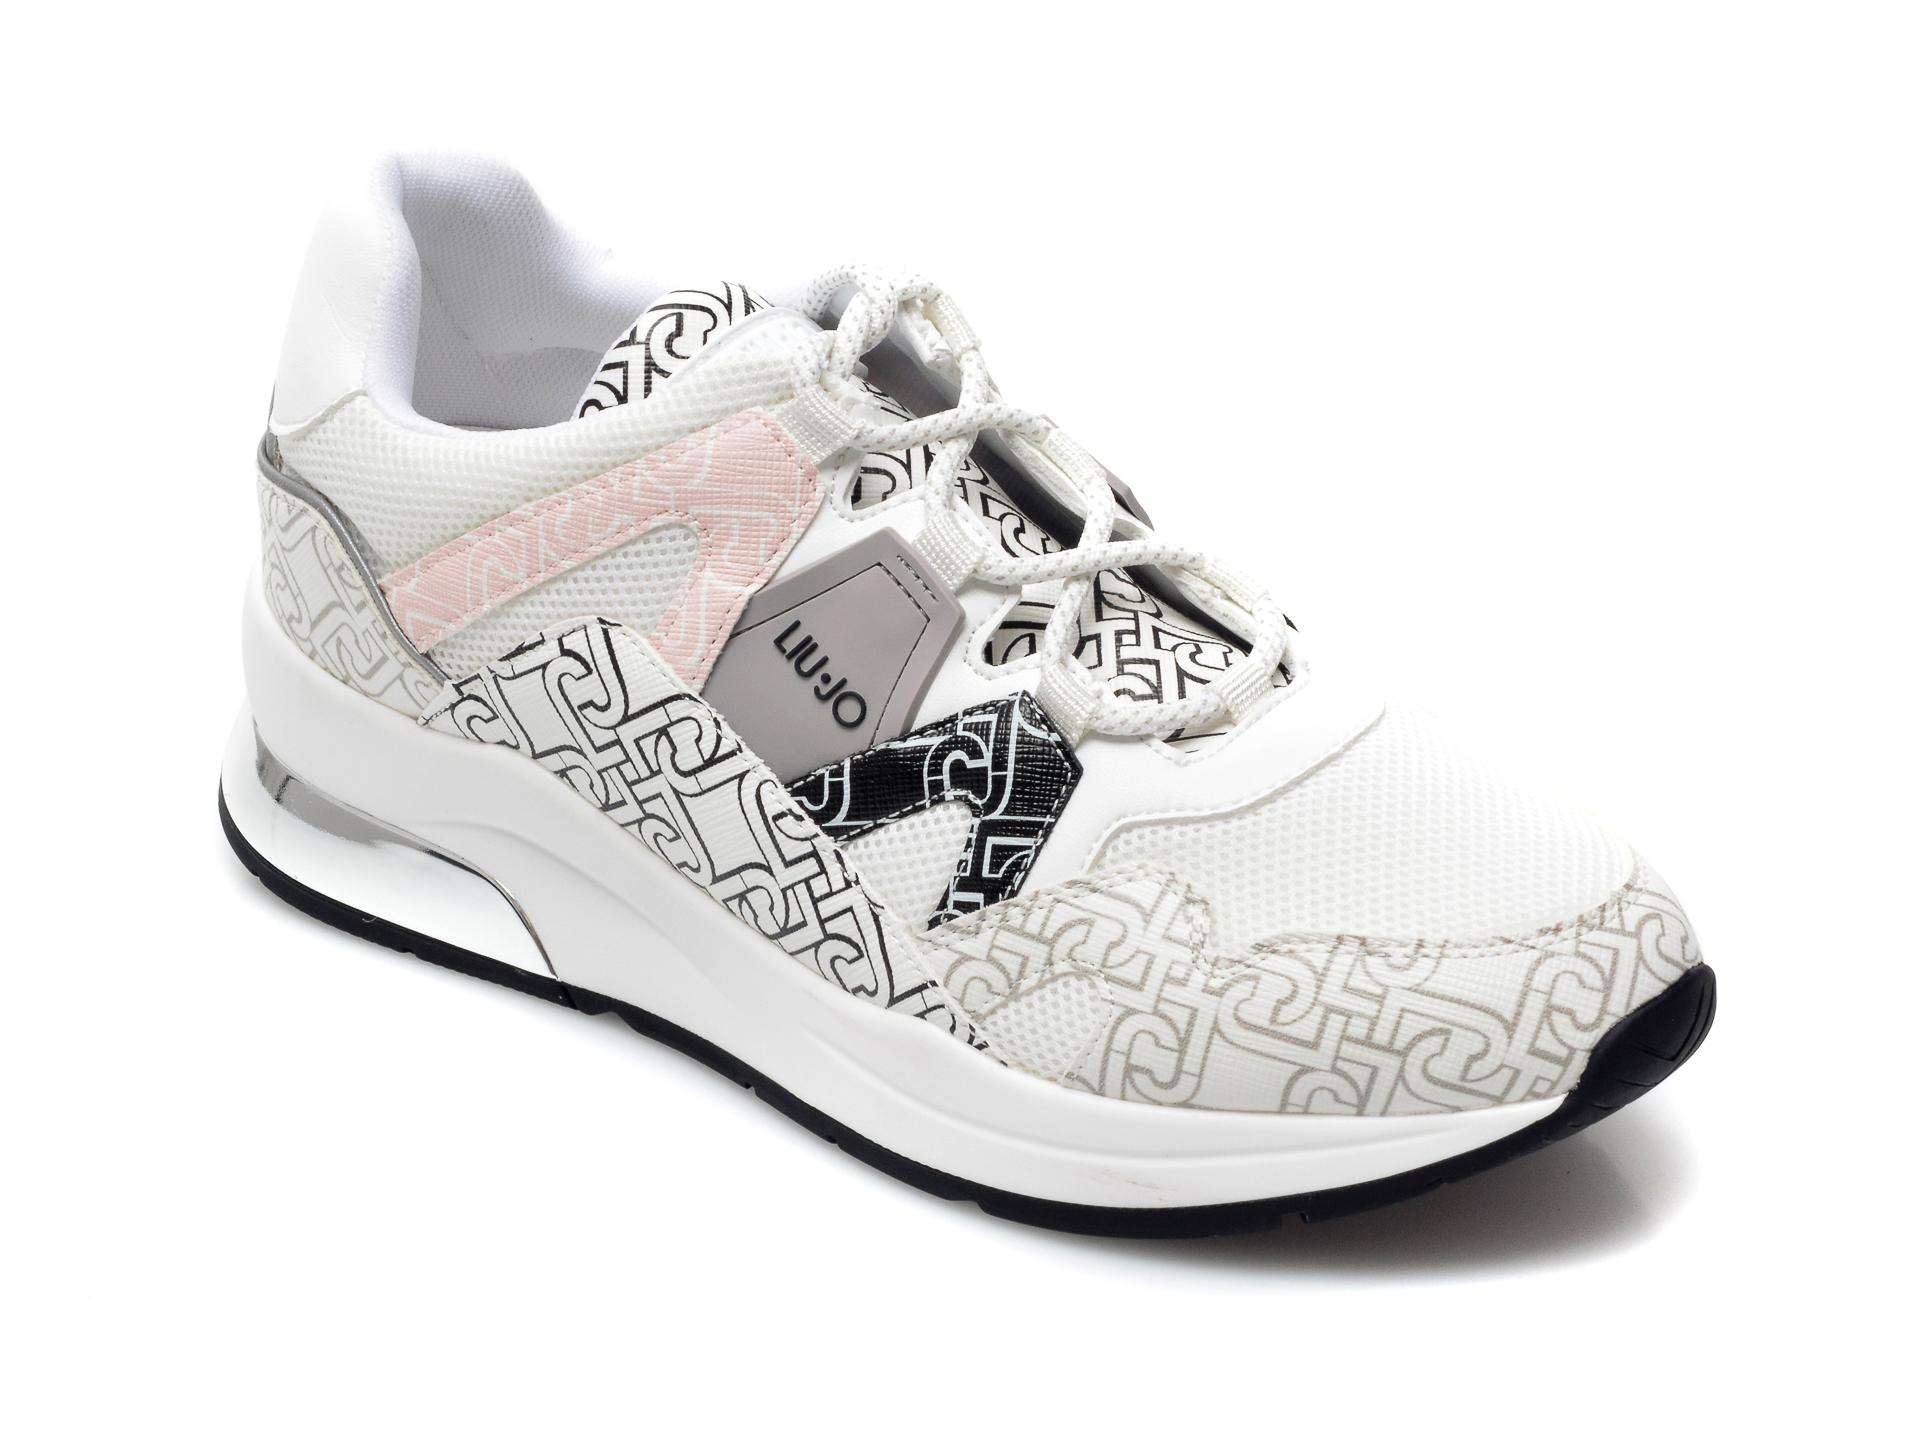 Pantofi sport LIU JO albi, Karlie 4, din material textil si piele ecologica